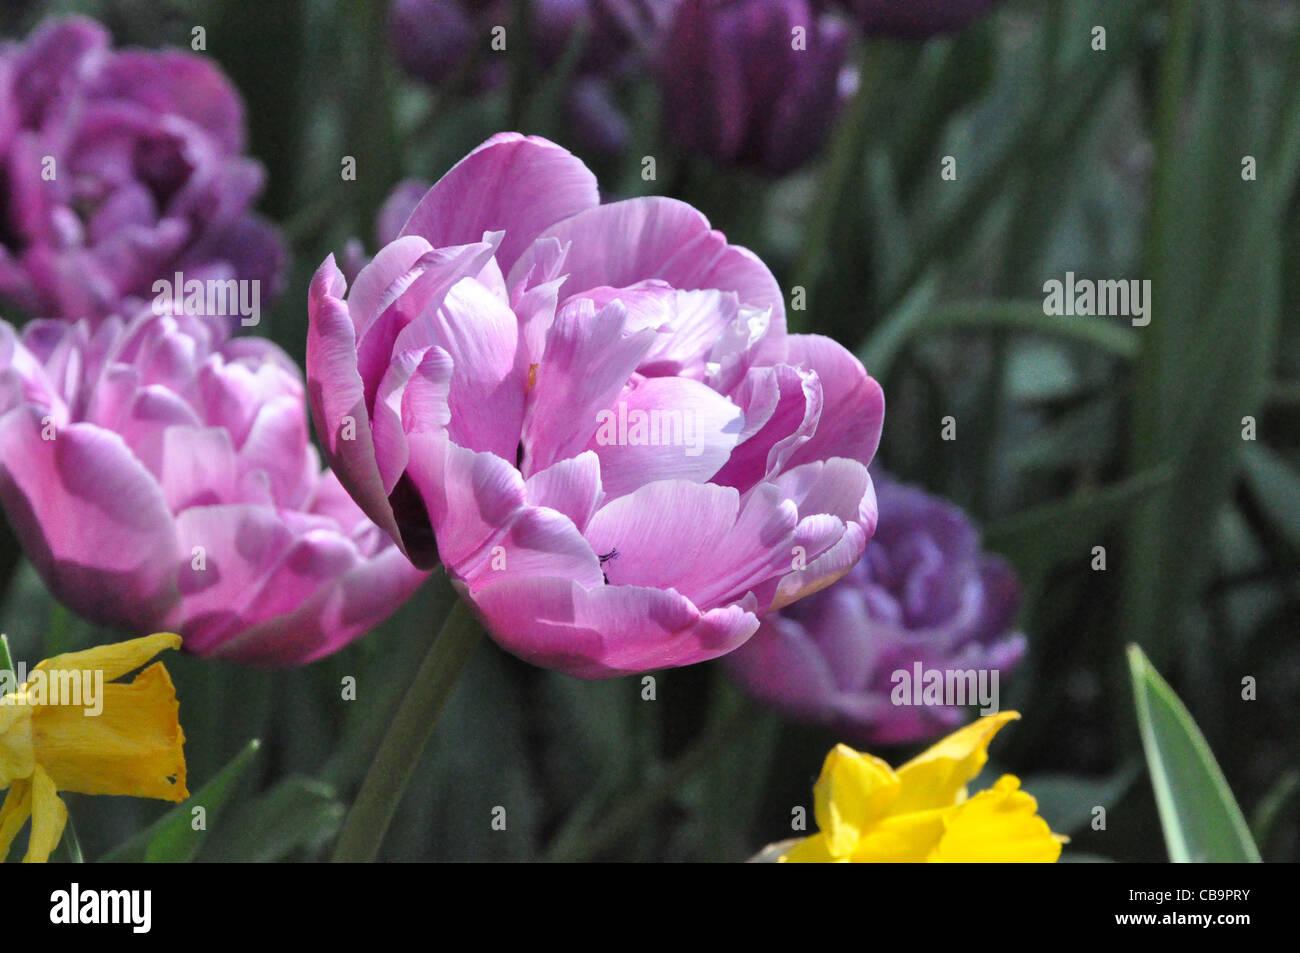 Tulpen im Frühling - Stock Image